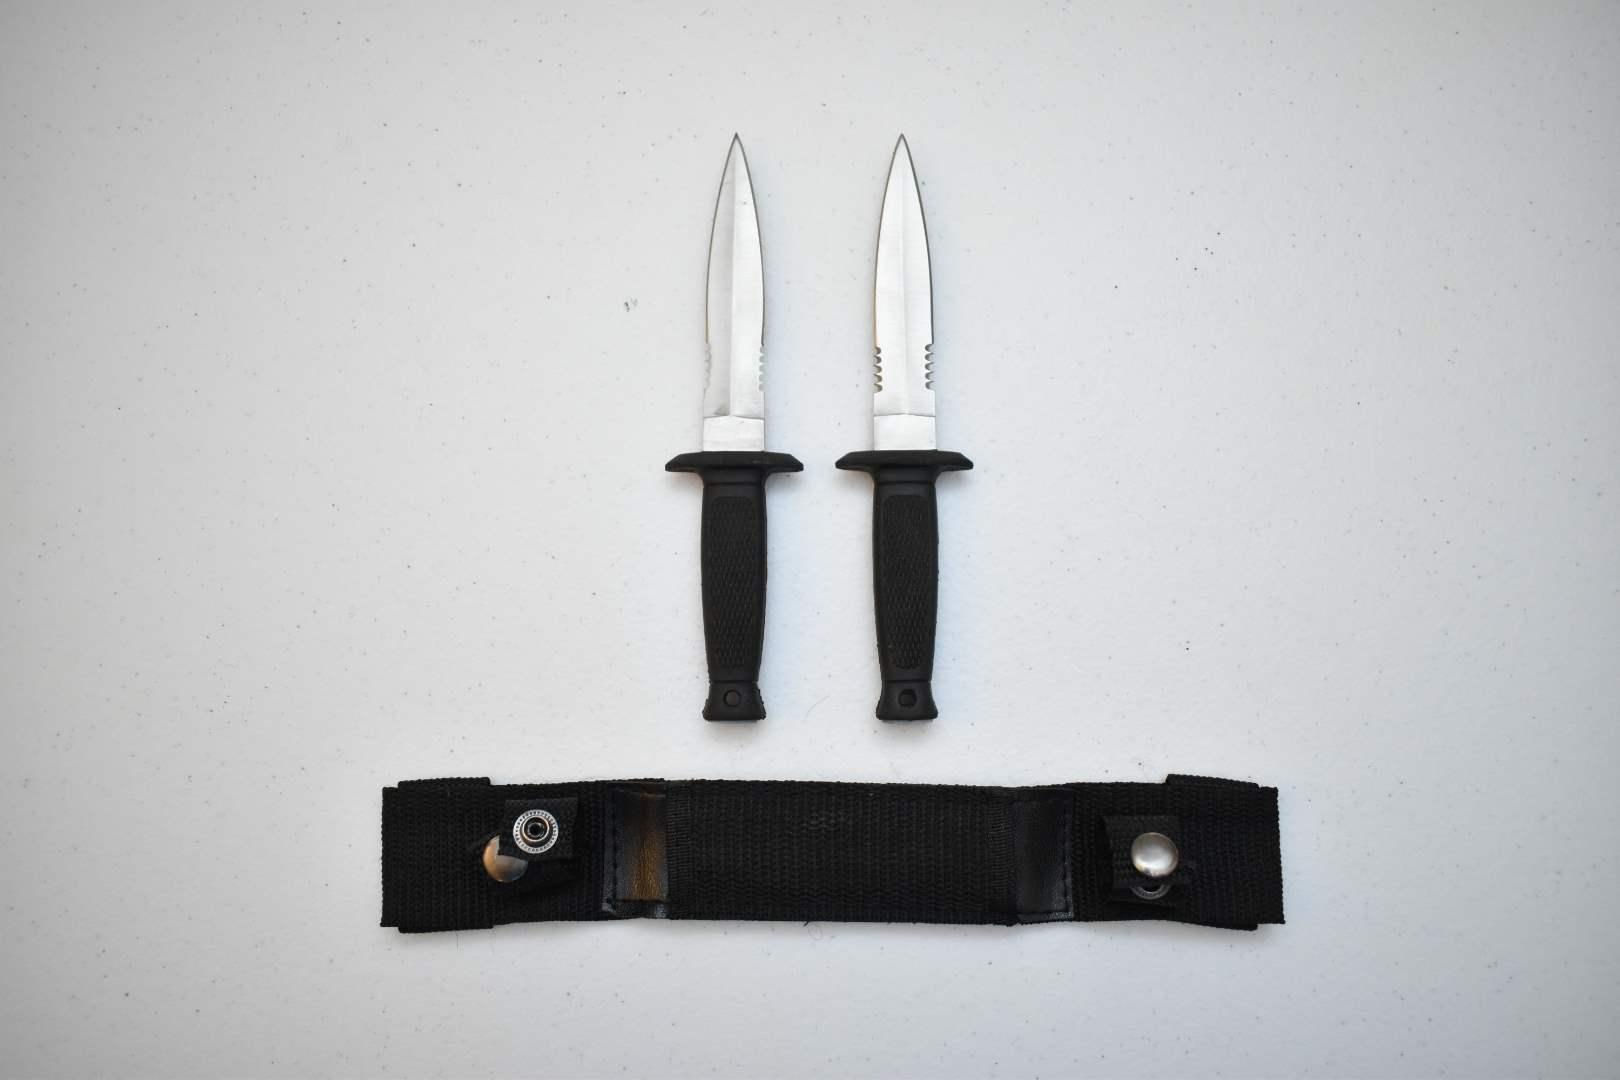 Throwing Daggers with Sheath